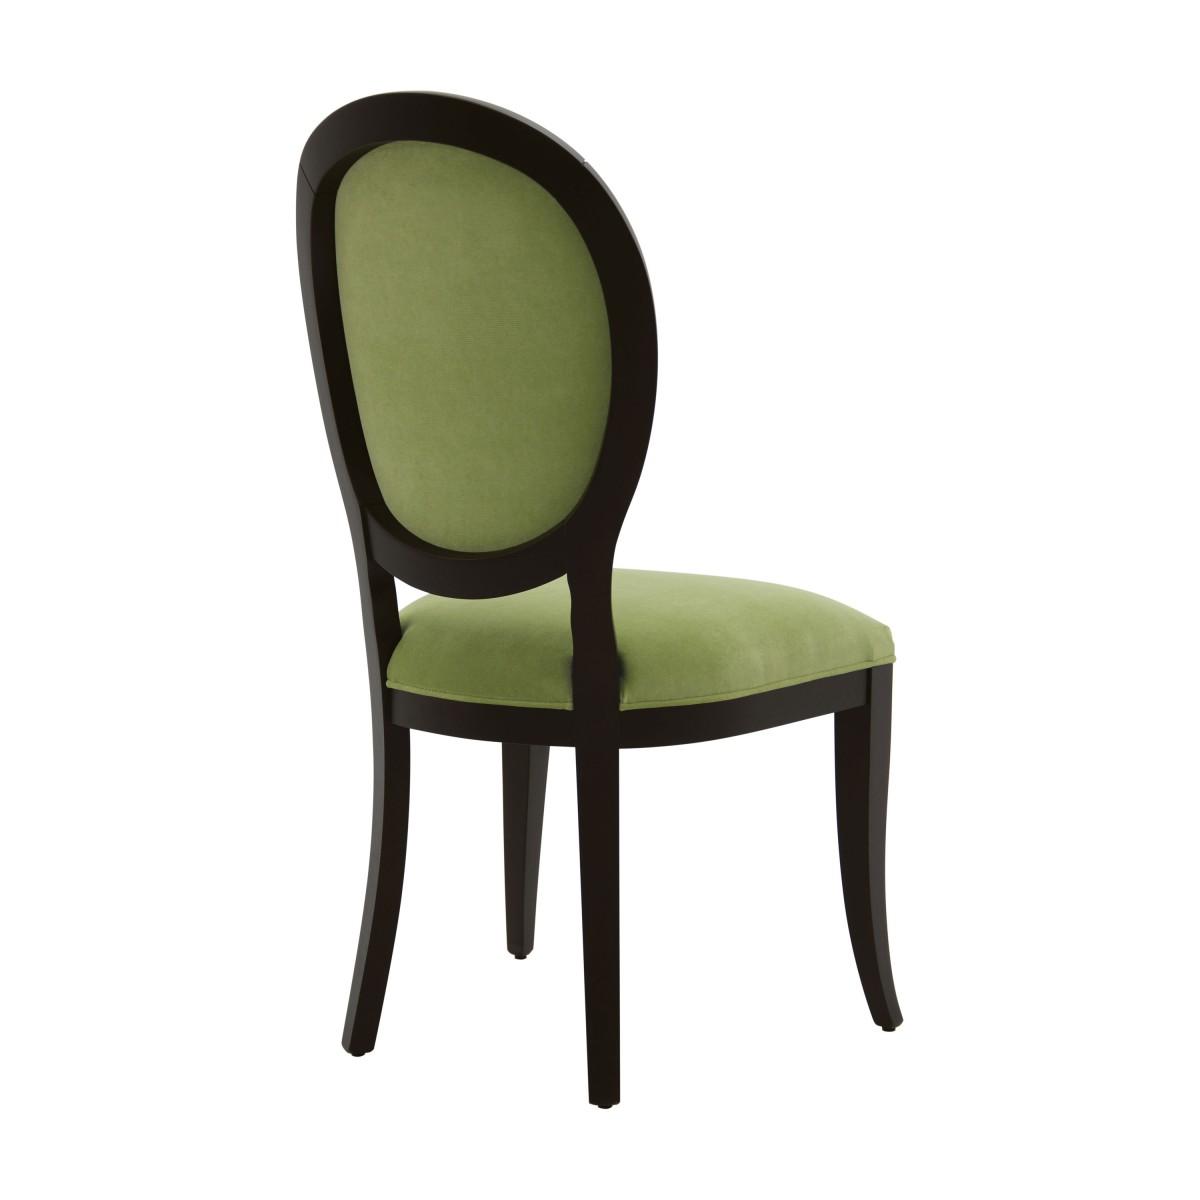 italian contemporary chair moderna 2 8121